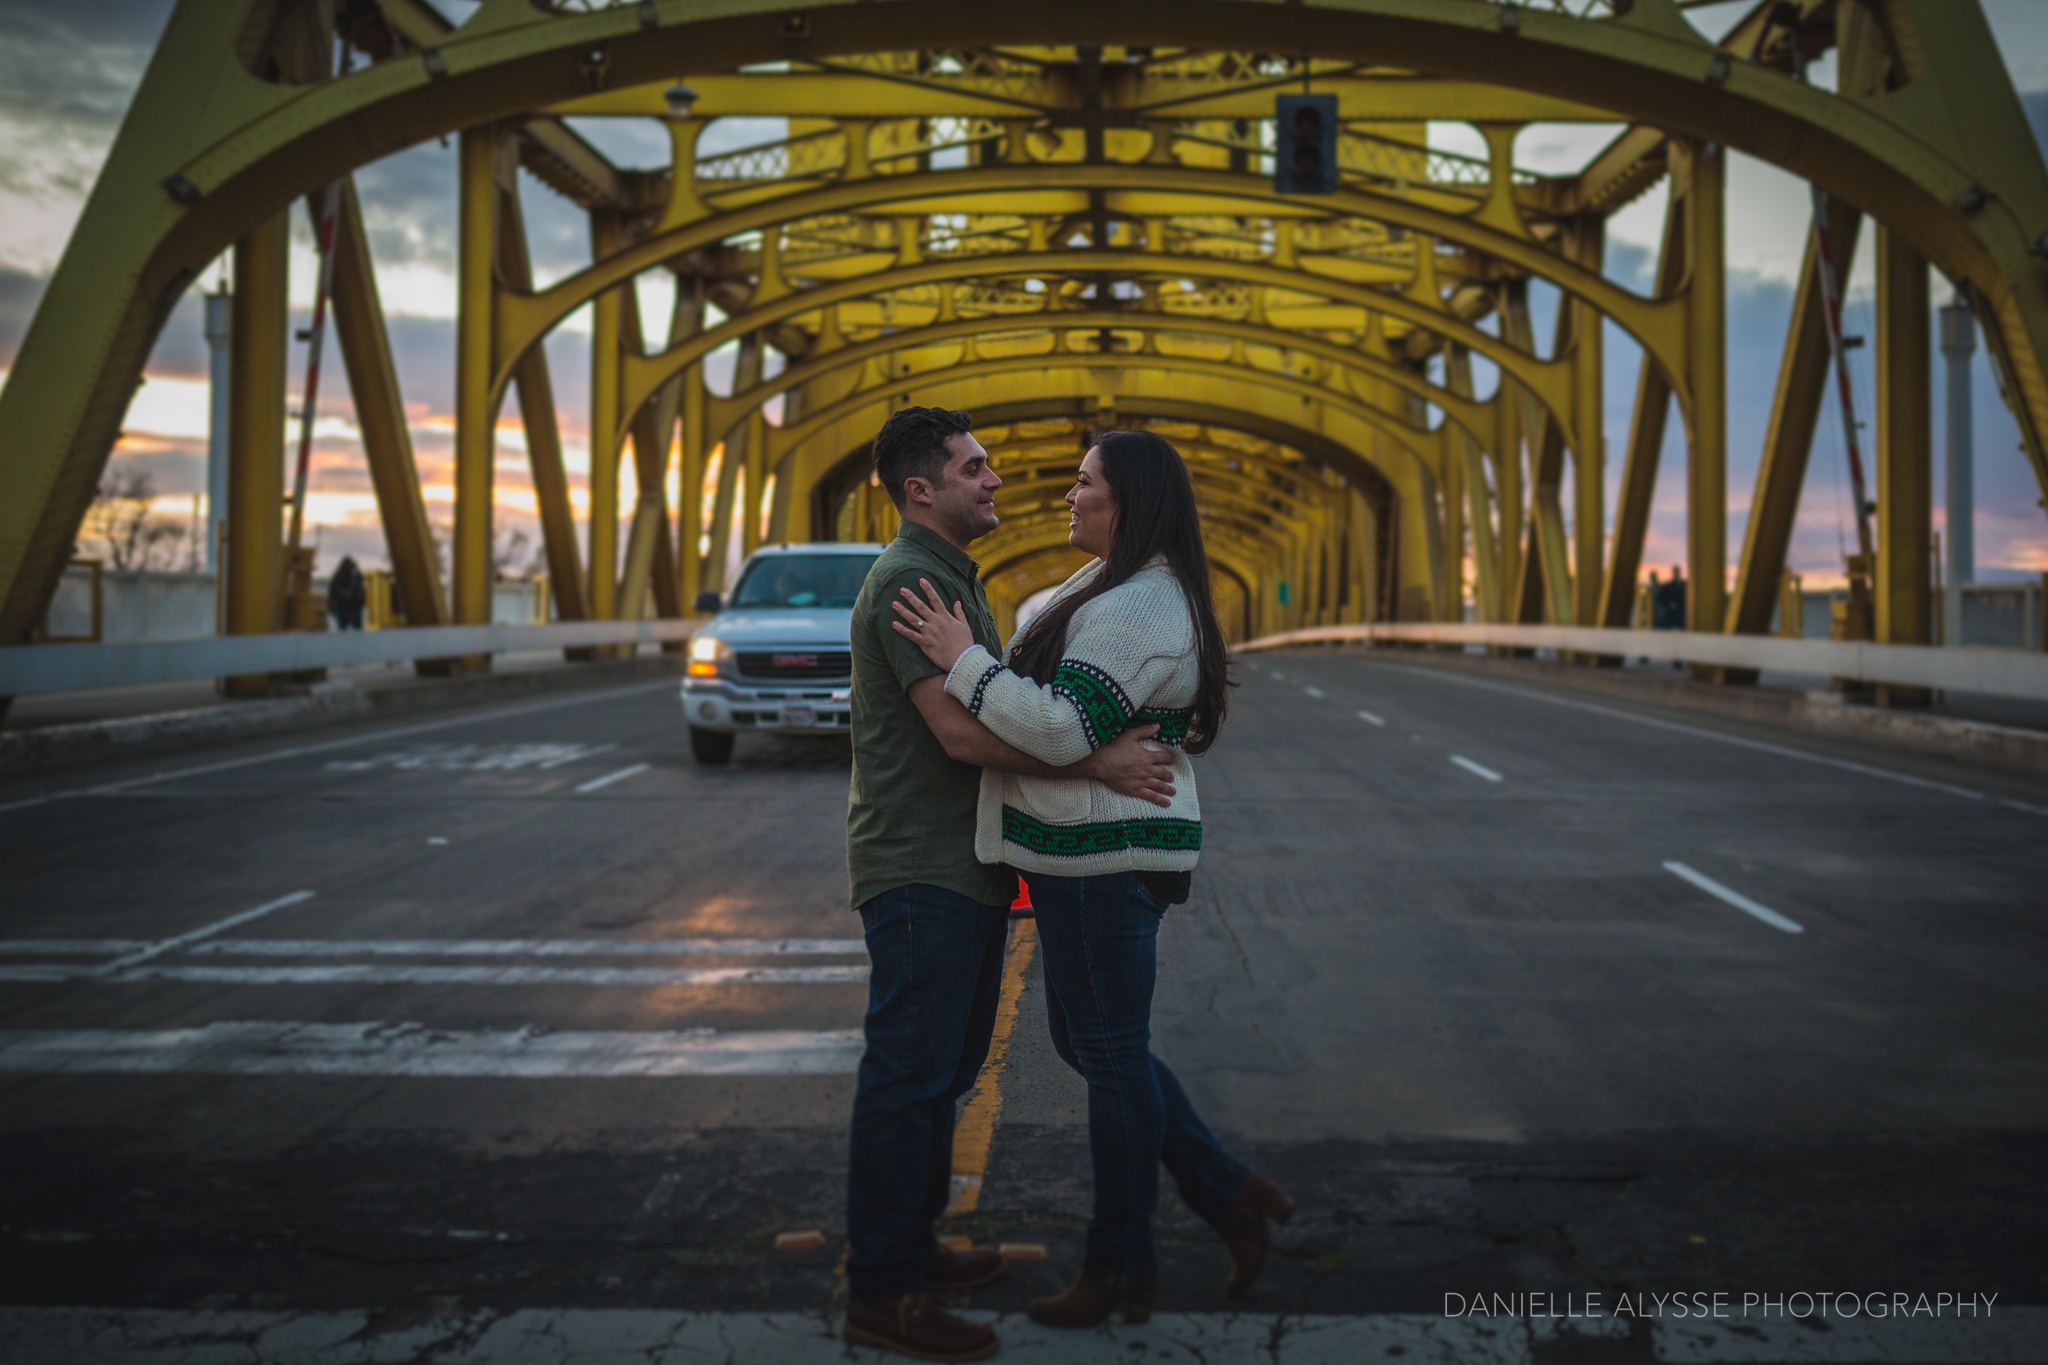 180324_engagement_lily_danielle_alysse_photography_downtown_sacramento_wedding_photographer_blog_76_WEB.jpg